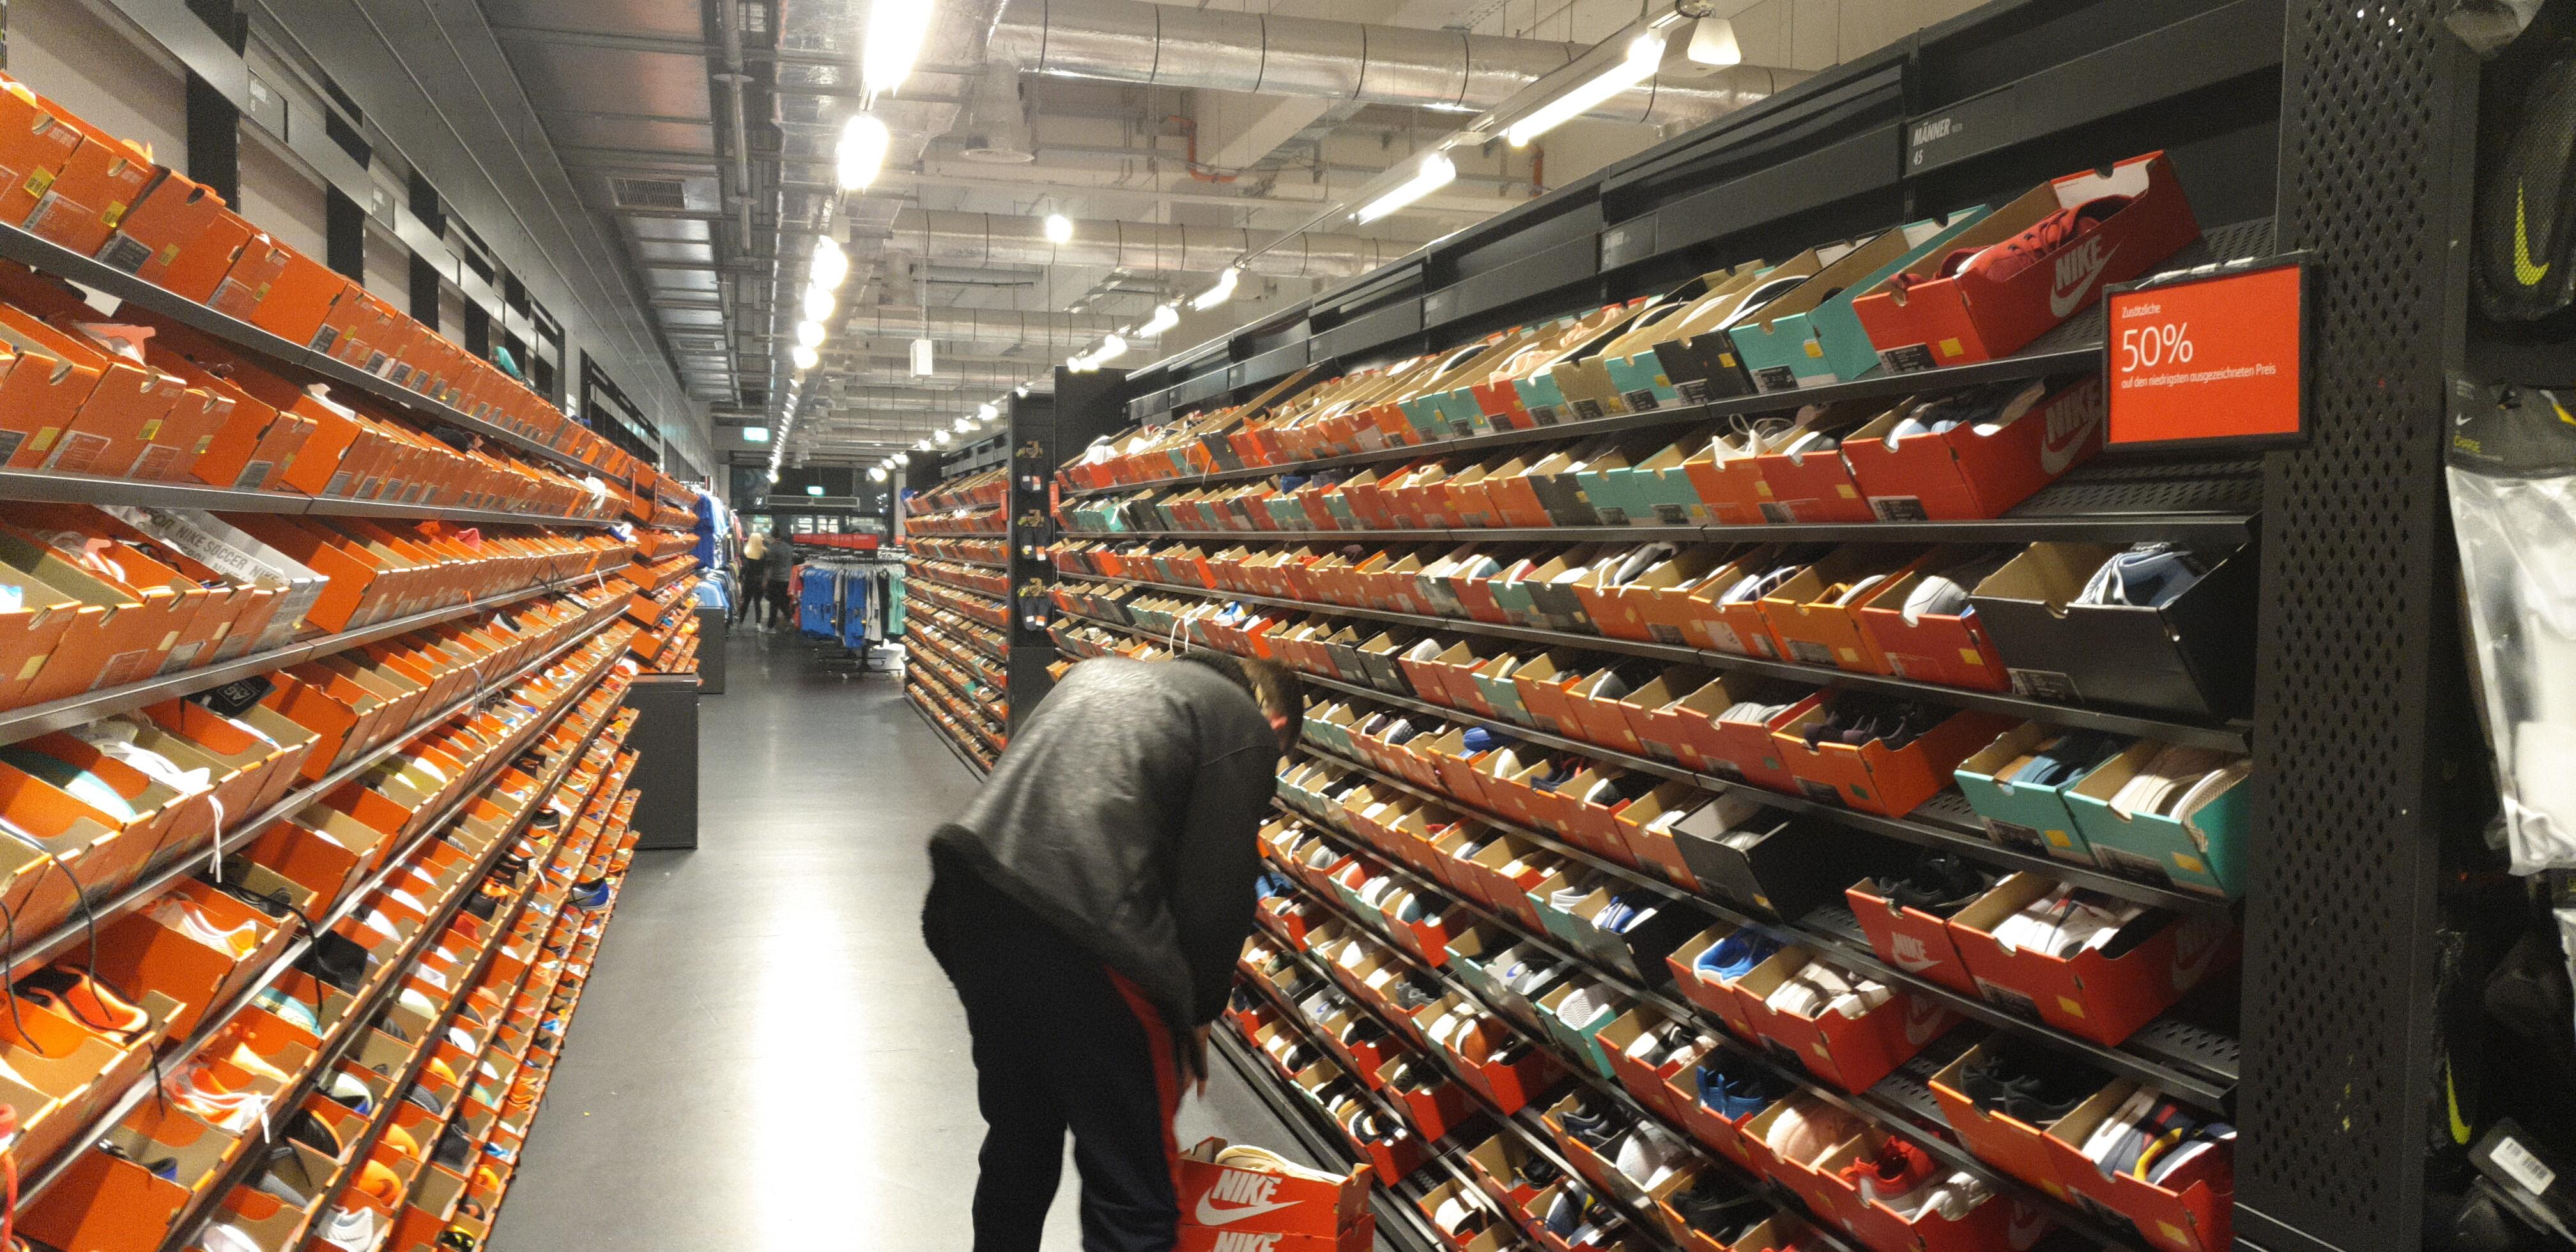 d47d50c09ae58 Nike Clearance Store Kerpen 50% auf reduzierte Schuhe - mydealz.de